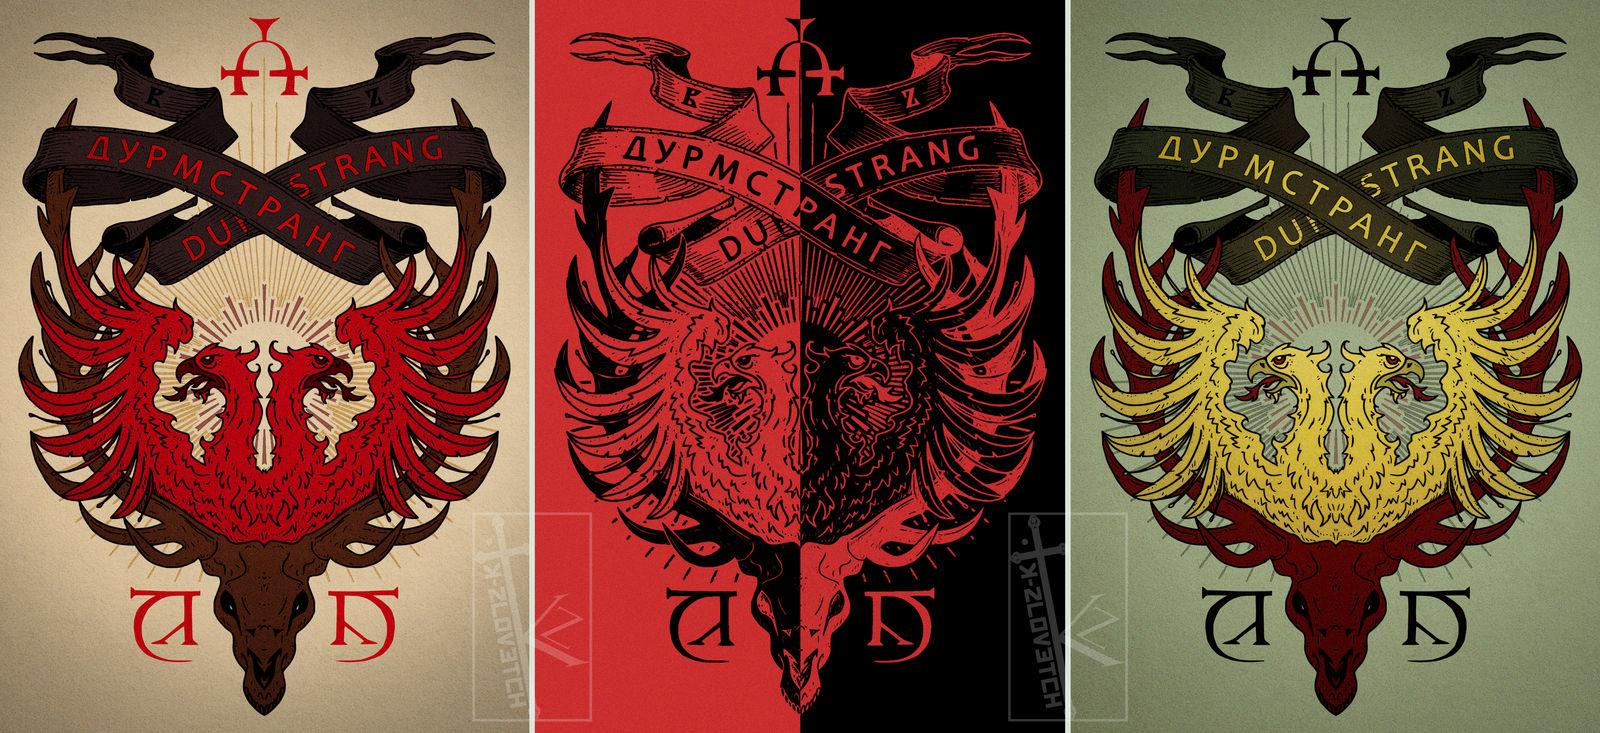 M1ttr7 Of8of M Wizarding schools around the world: https www deviantart com k zlovetch art durmstrang institute emblem 762646340